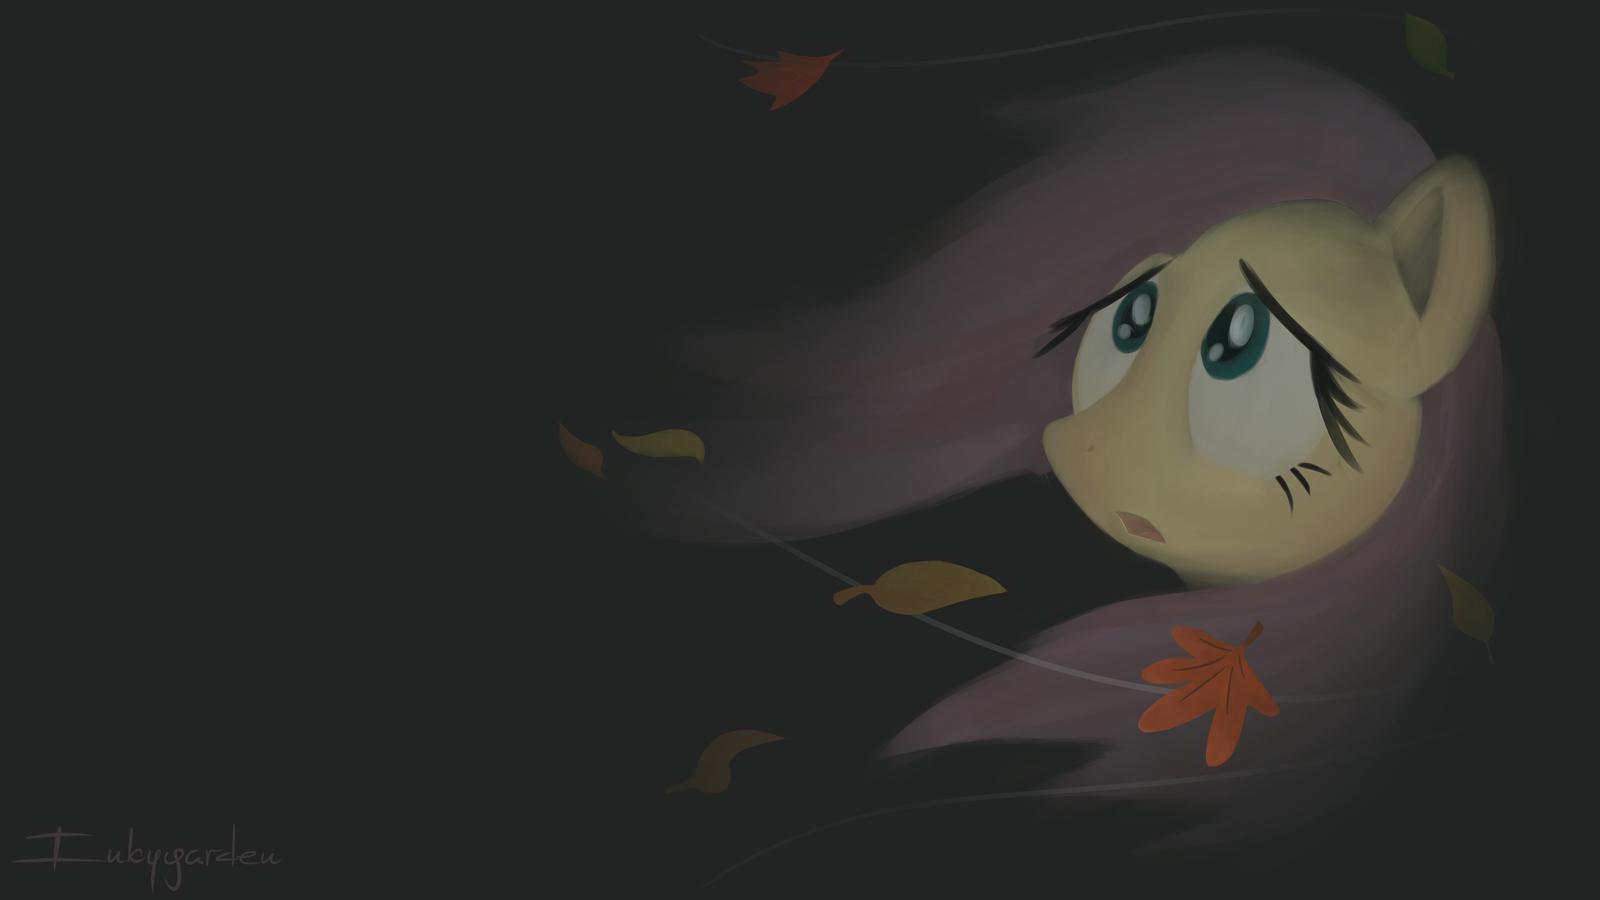 Autumn Fluttershy by Inkygarden.deviantart.com on @DeviantArt